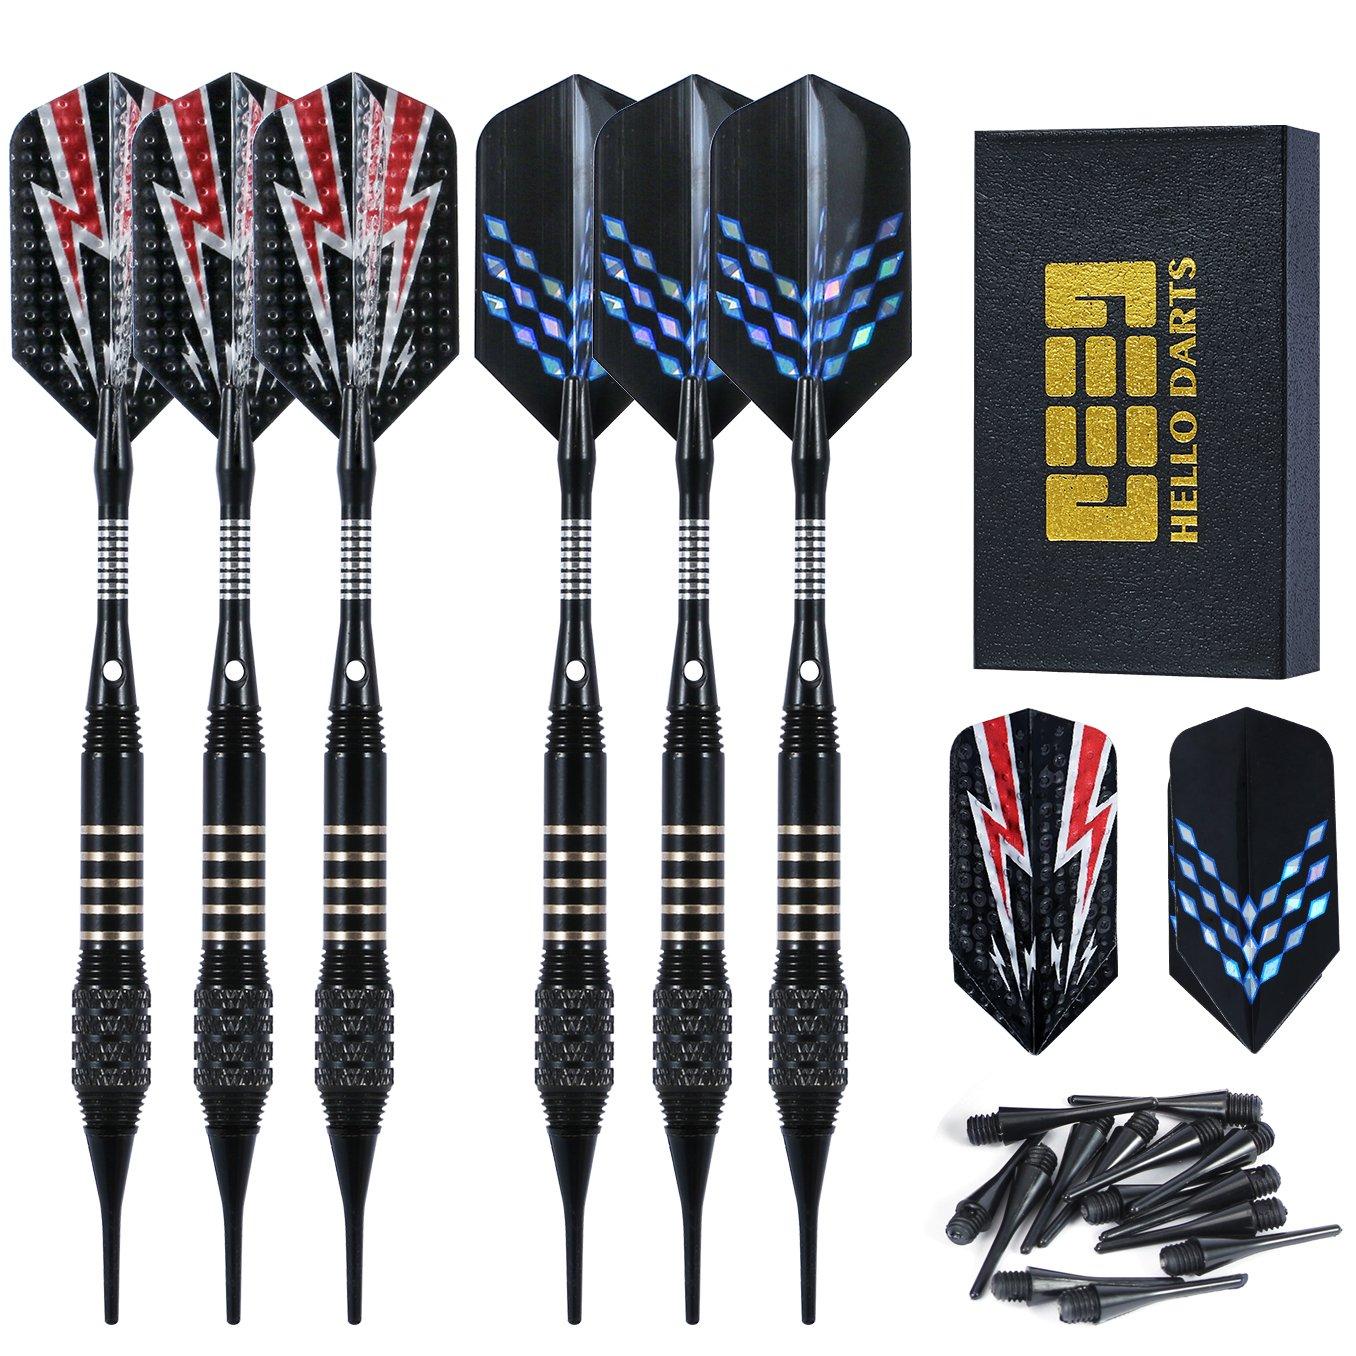 Vopa 6 Pack Professional 18 Grams Soft Tip Dart Set with 18 Plastic Soft Tip Points Aluminum Shafts and Slim Dart Flight for Electronic Dartboard